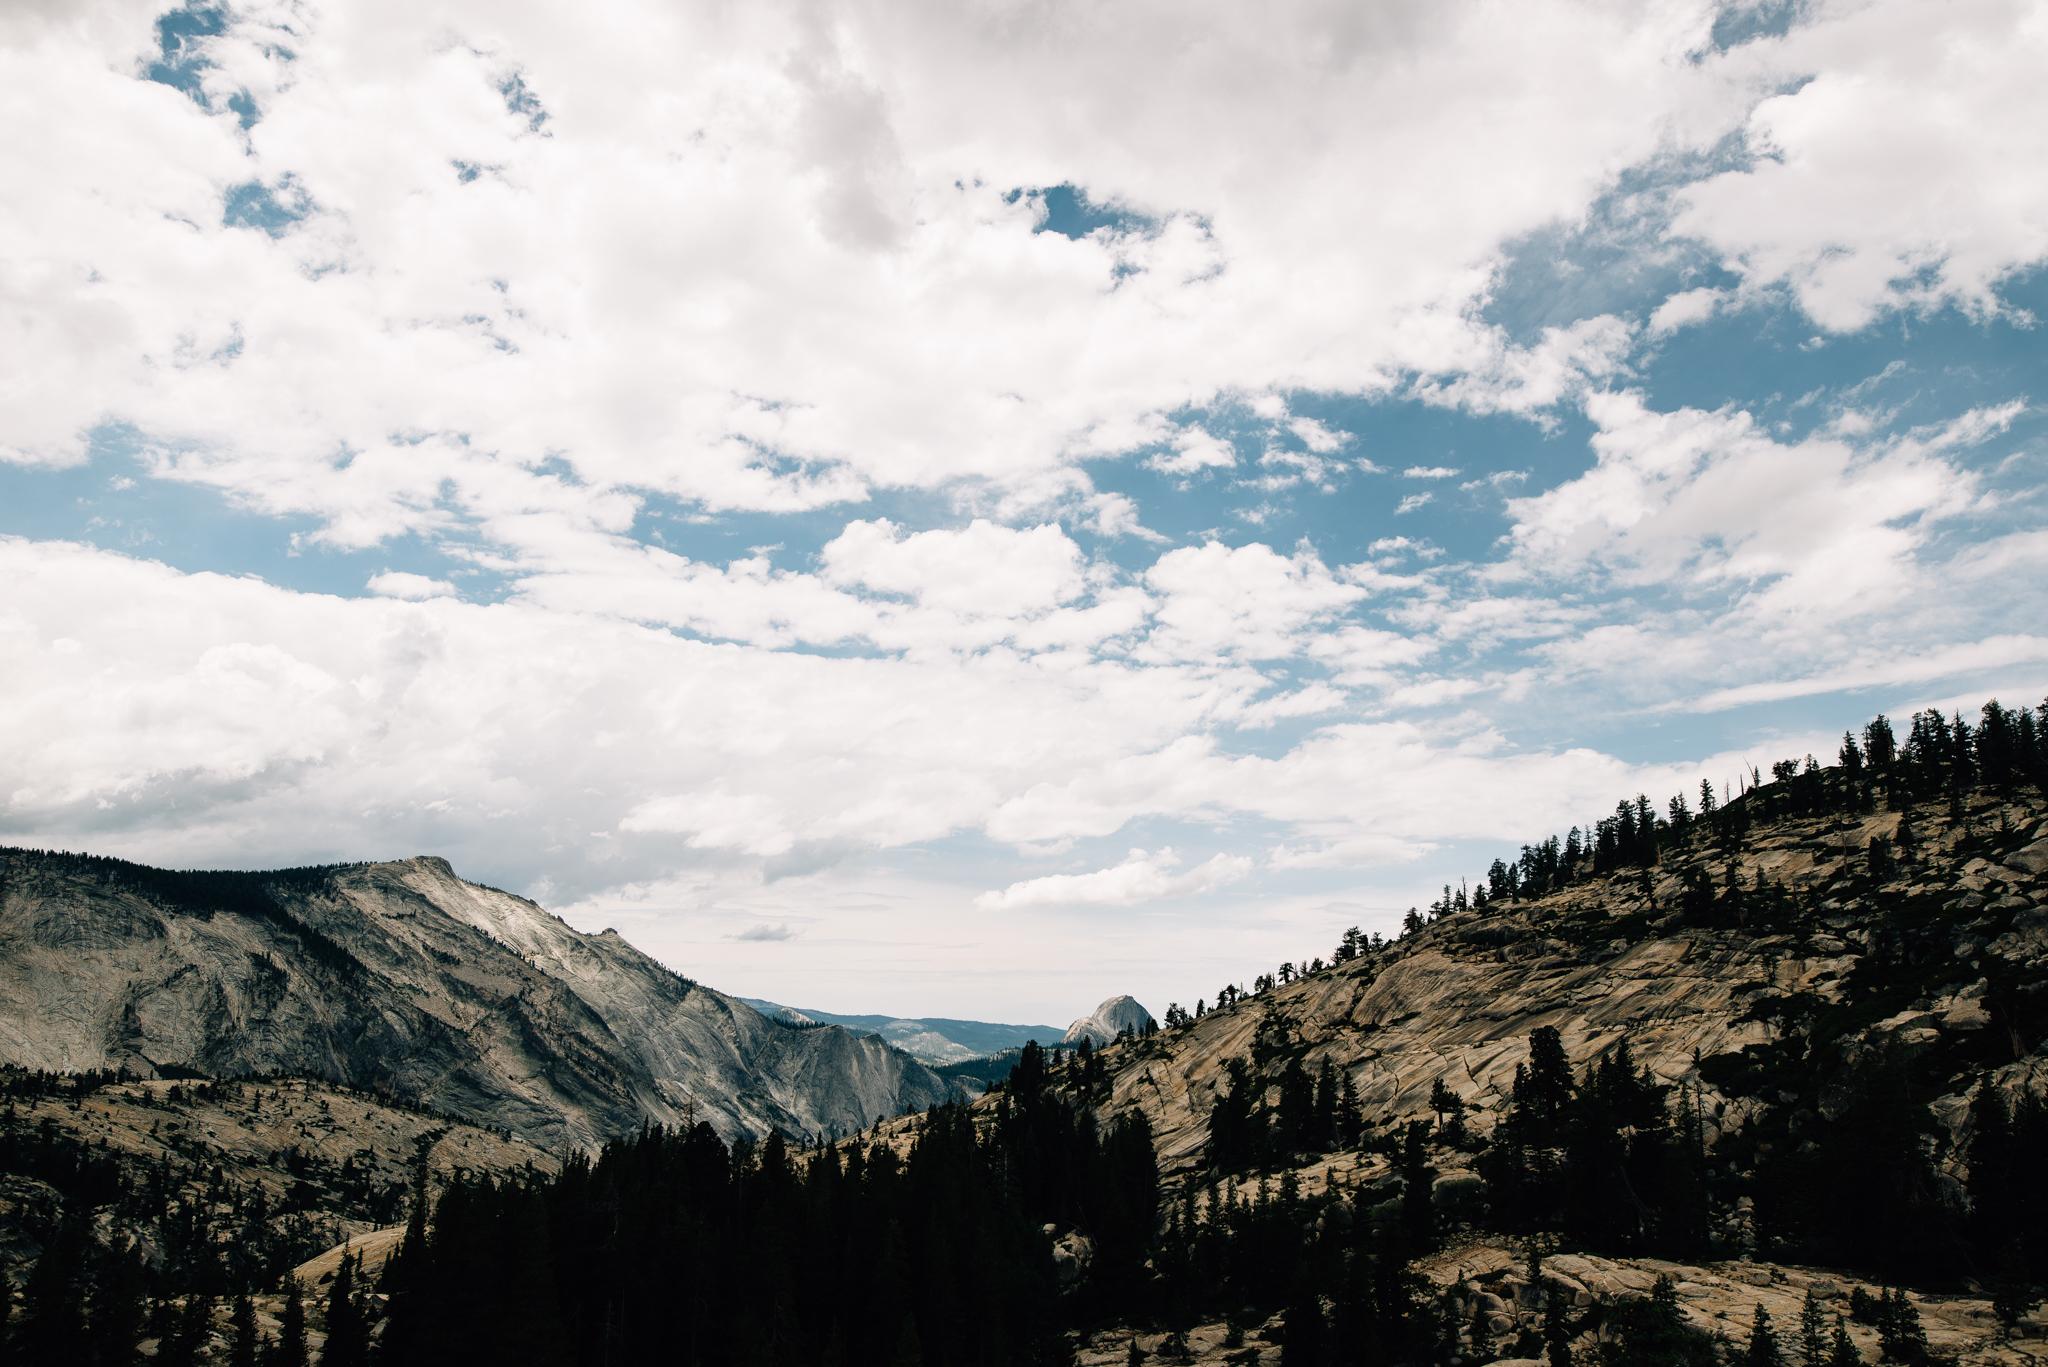 ©The Ryans Photography - Los Angeles Travel - Tuolomne Meadows Yosemite-030.jpg